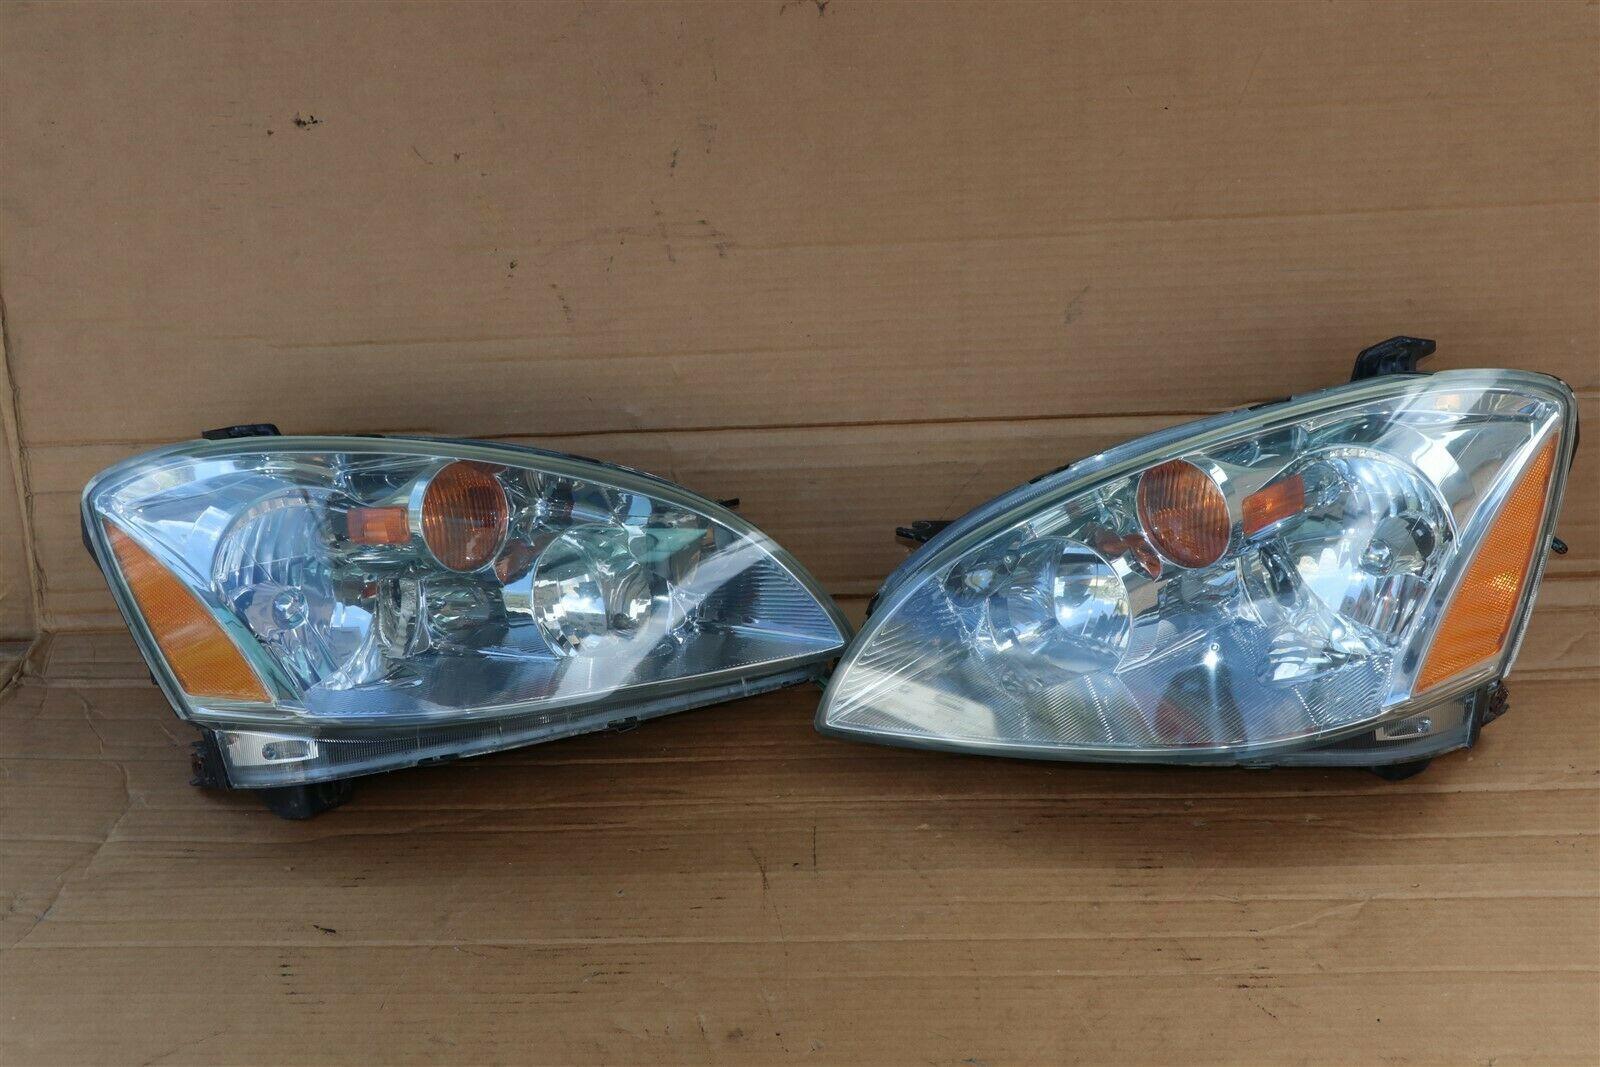 03-04 Nissan Altima Xenon HID Headlight Head Light Lamps Set L&R - POLISHED